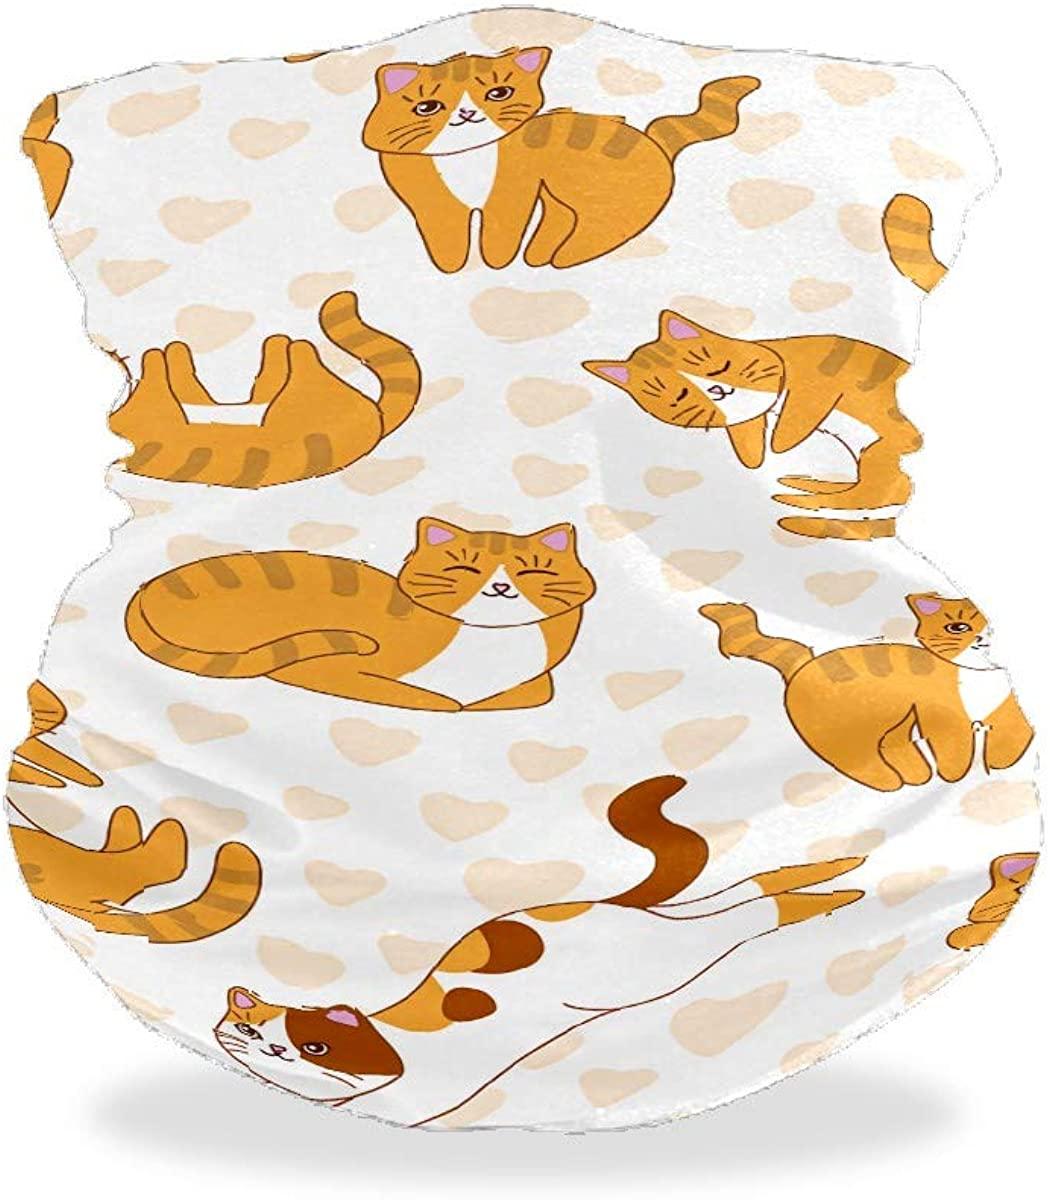 J.COXLOD Face Scarf Neck Gaiter, Adjustable Reusable Bandana, Sun UV Protection Cool Lightweight Face Cover for Women& Men Cat Printed